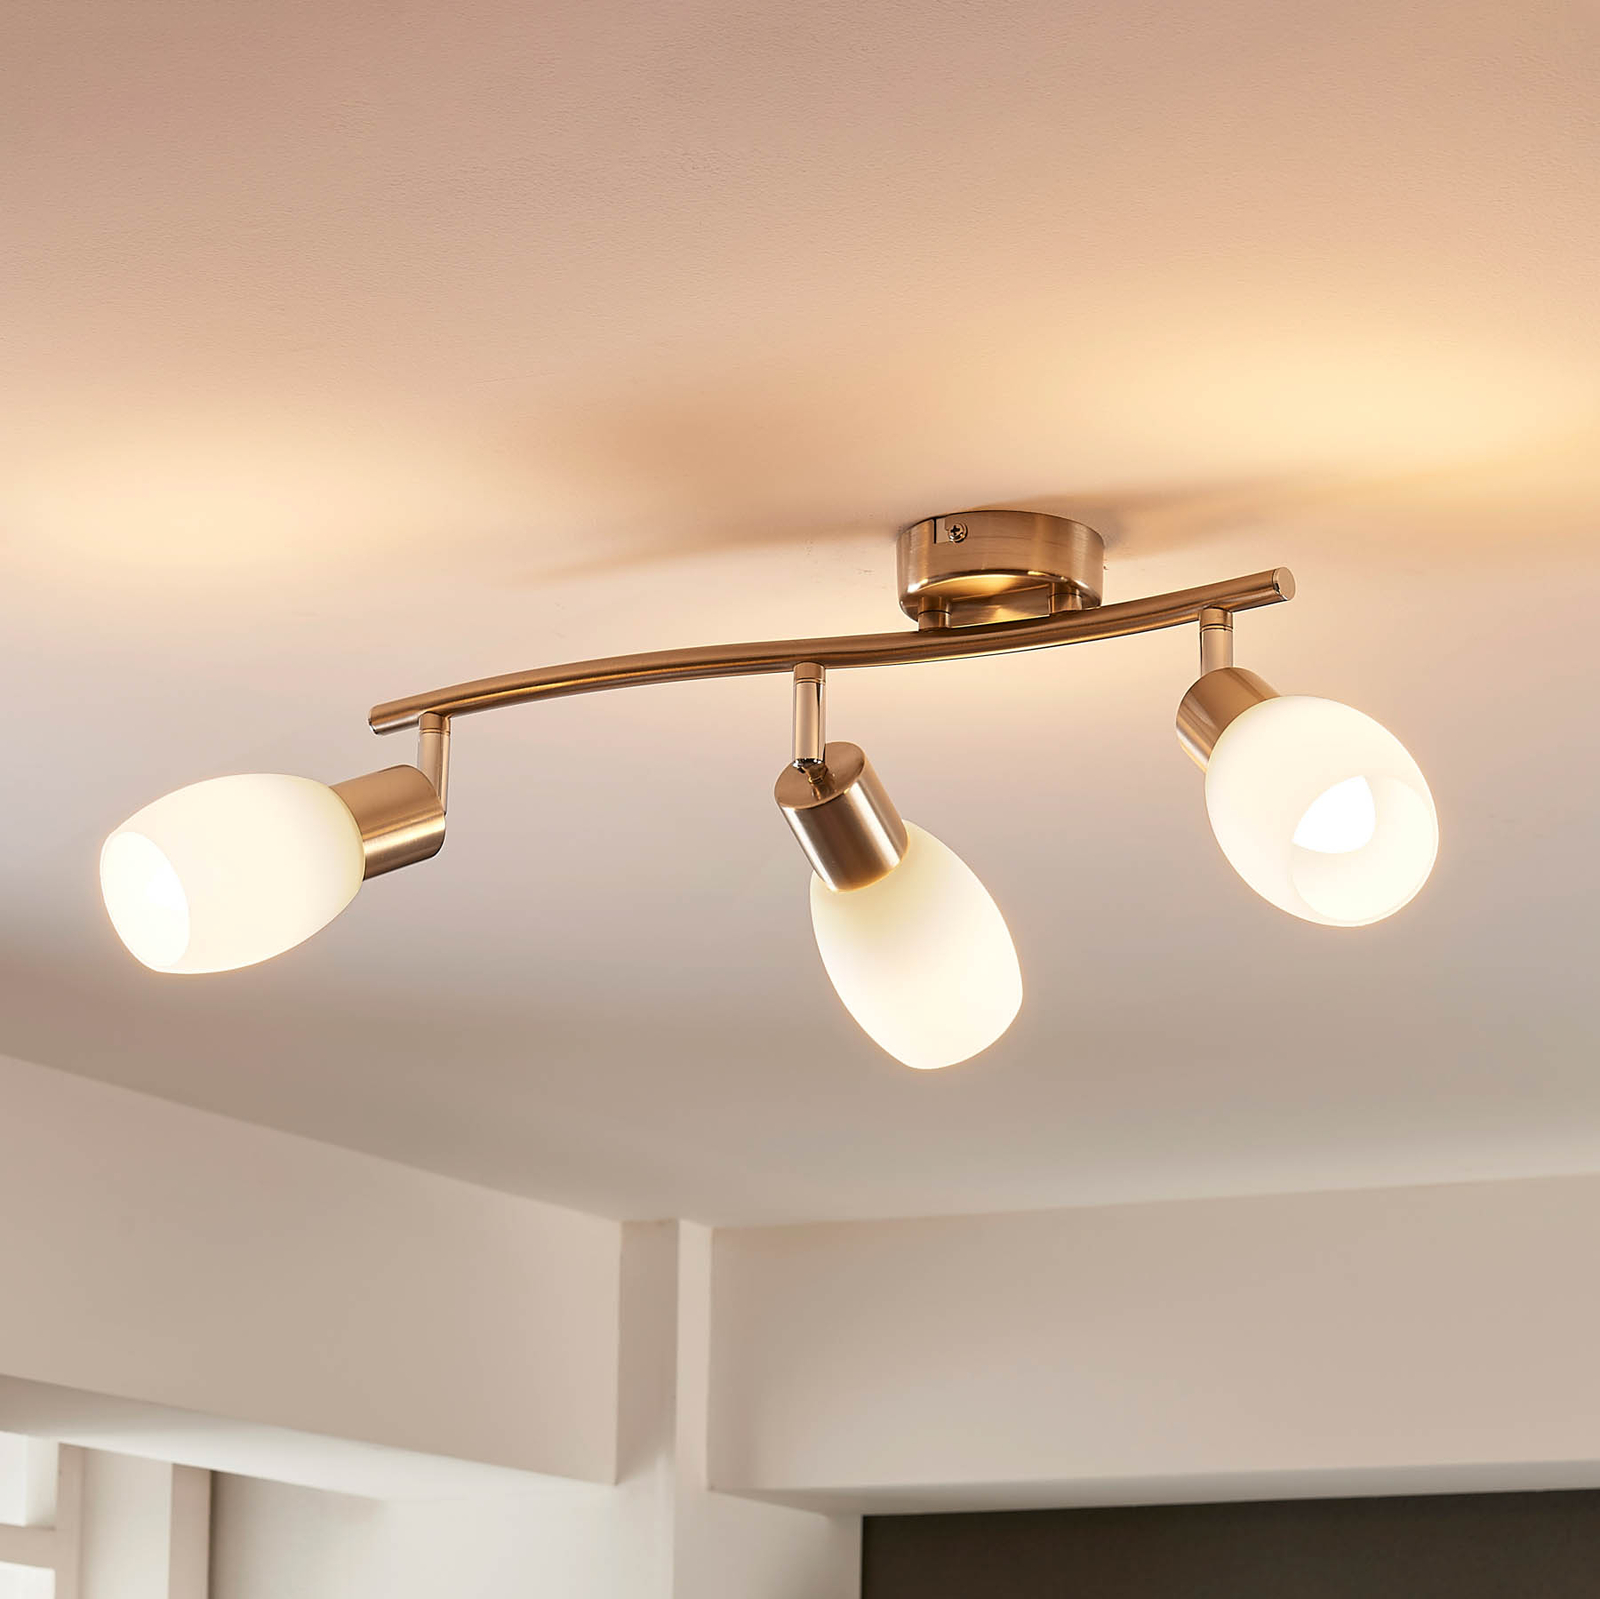 Lindby Arda LED-Strahler, Glas, dreiflammig 40 cm